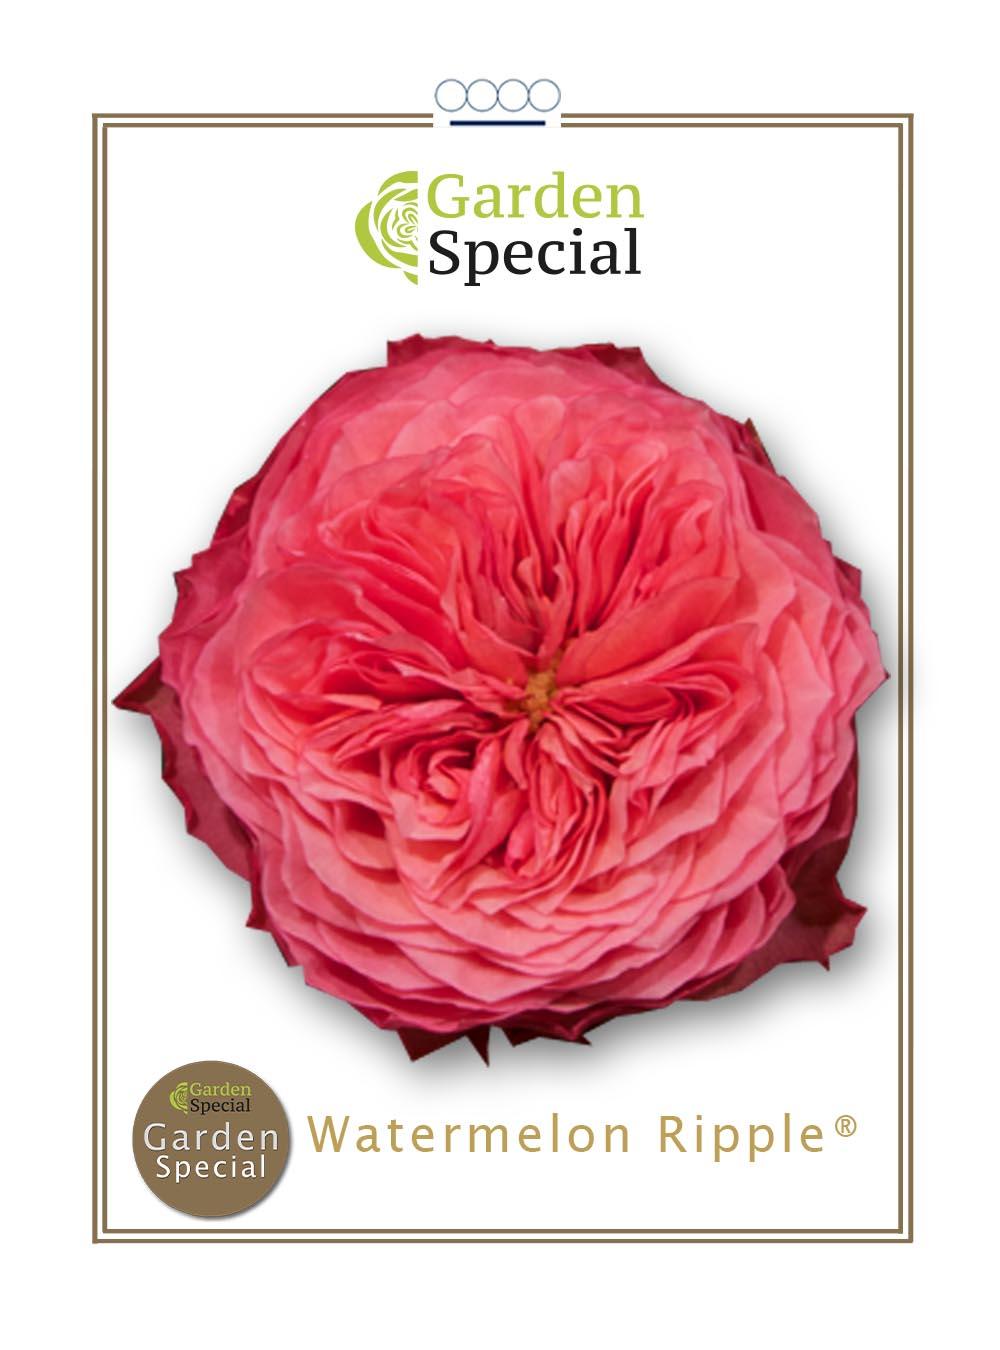 Watermelon Ripple®